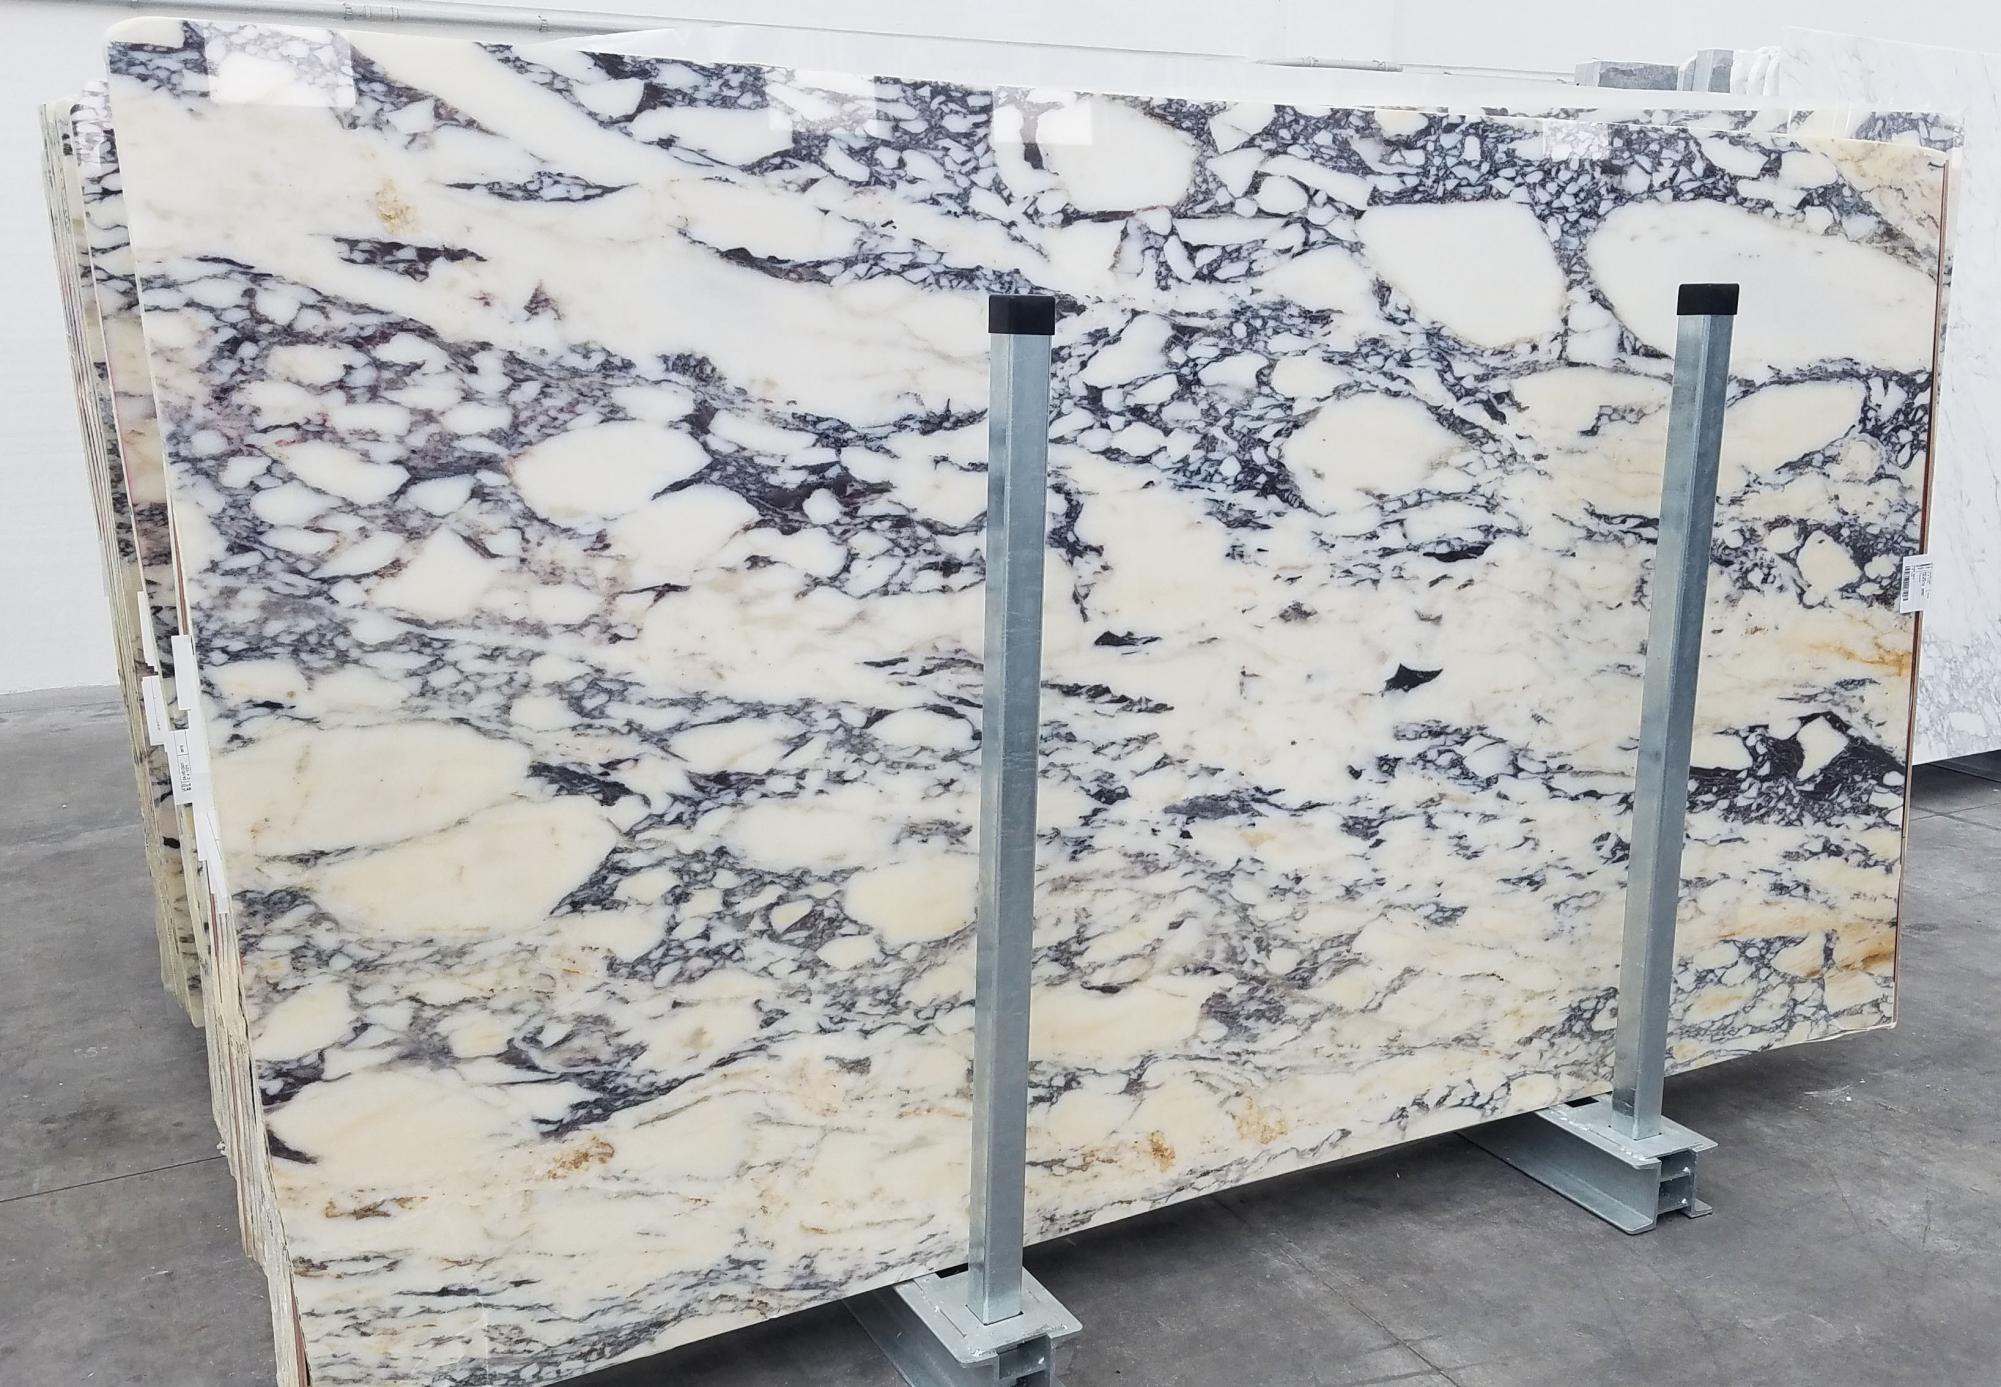 CALACATTA MONET Fourniture Veneto (Italie) d' dalles brillantes en marbre naturel 1371 , Slab #41